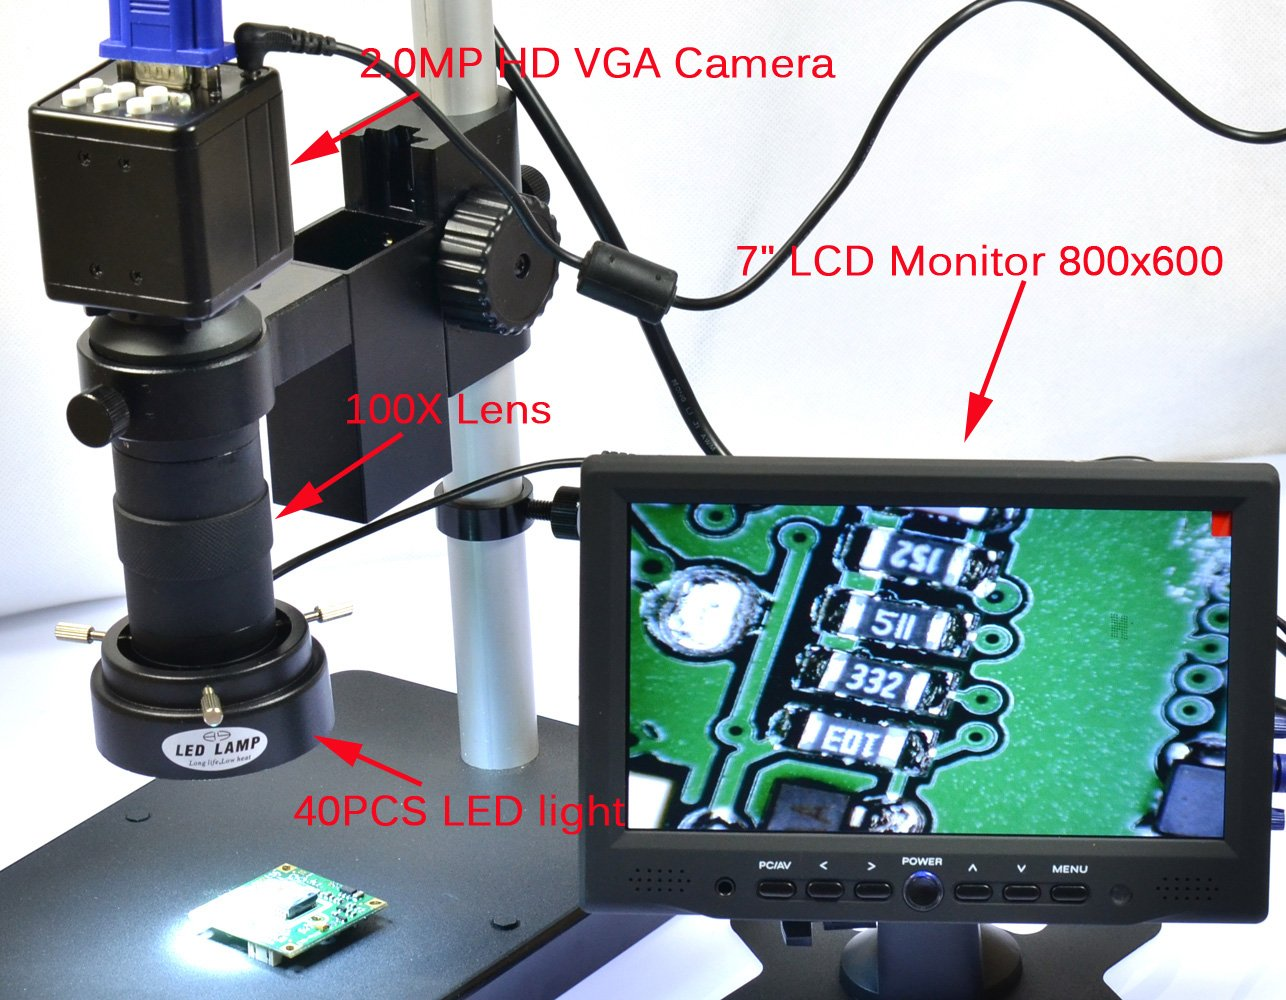 2.0MP HD Digital C-mount Industry Microscope Camera VGA Output Lab 1920x1080